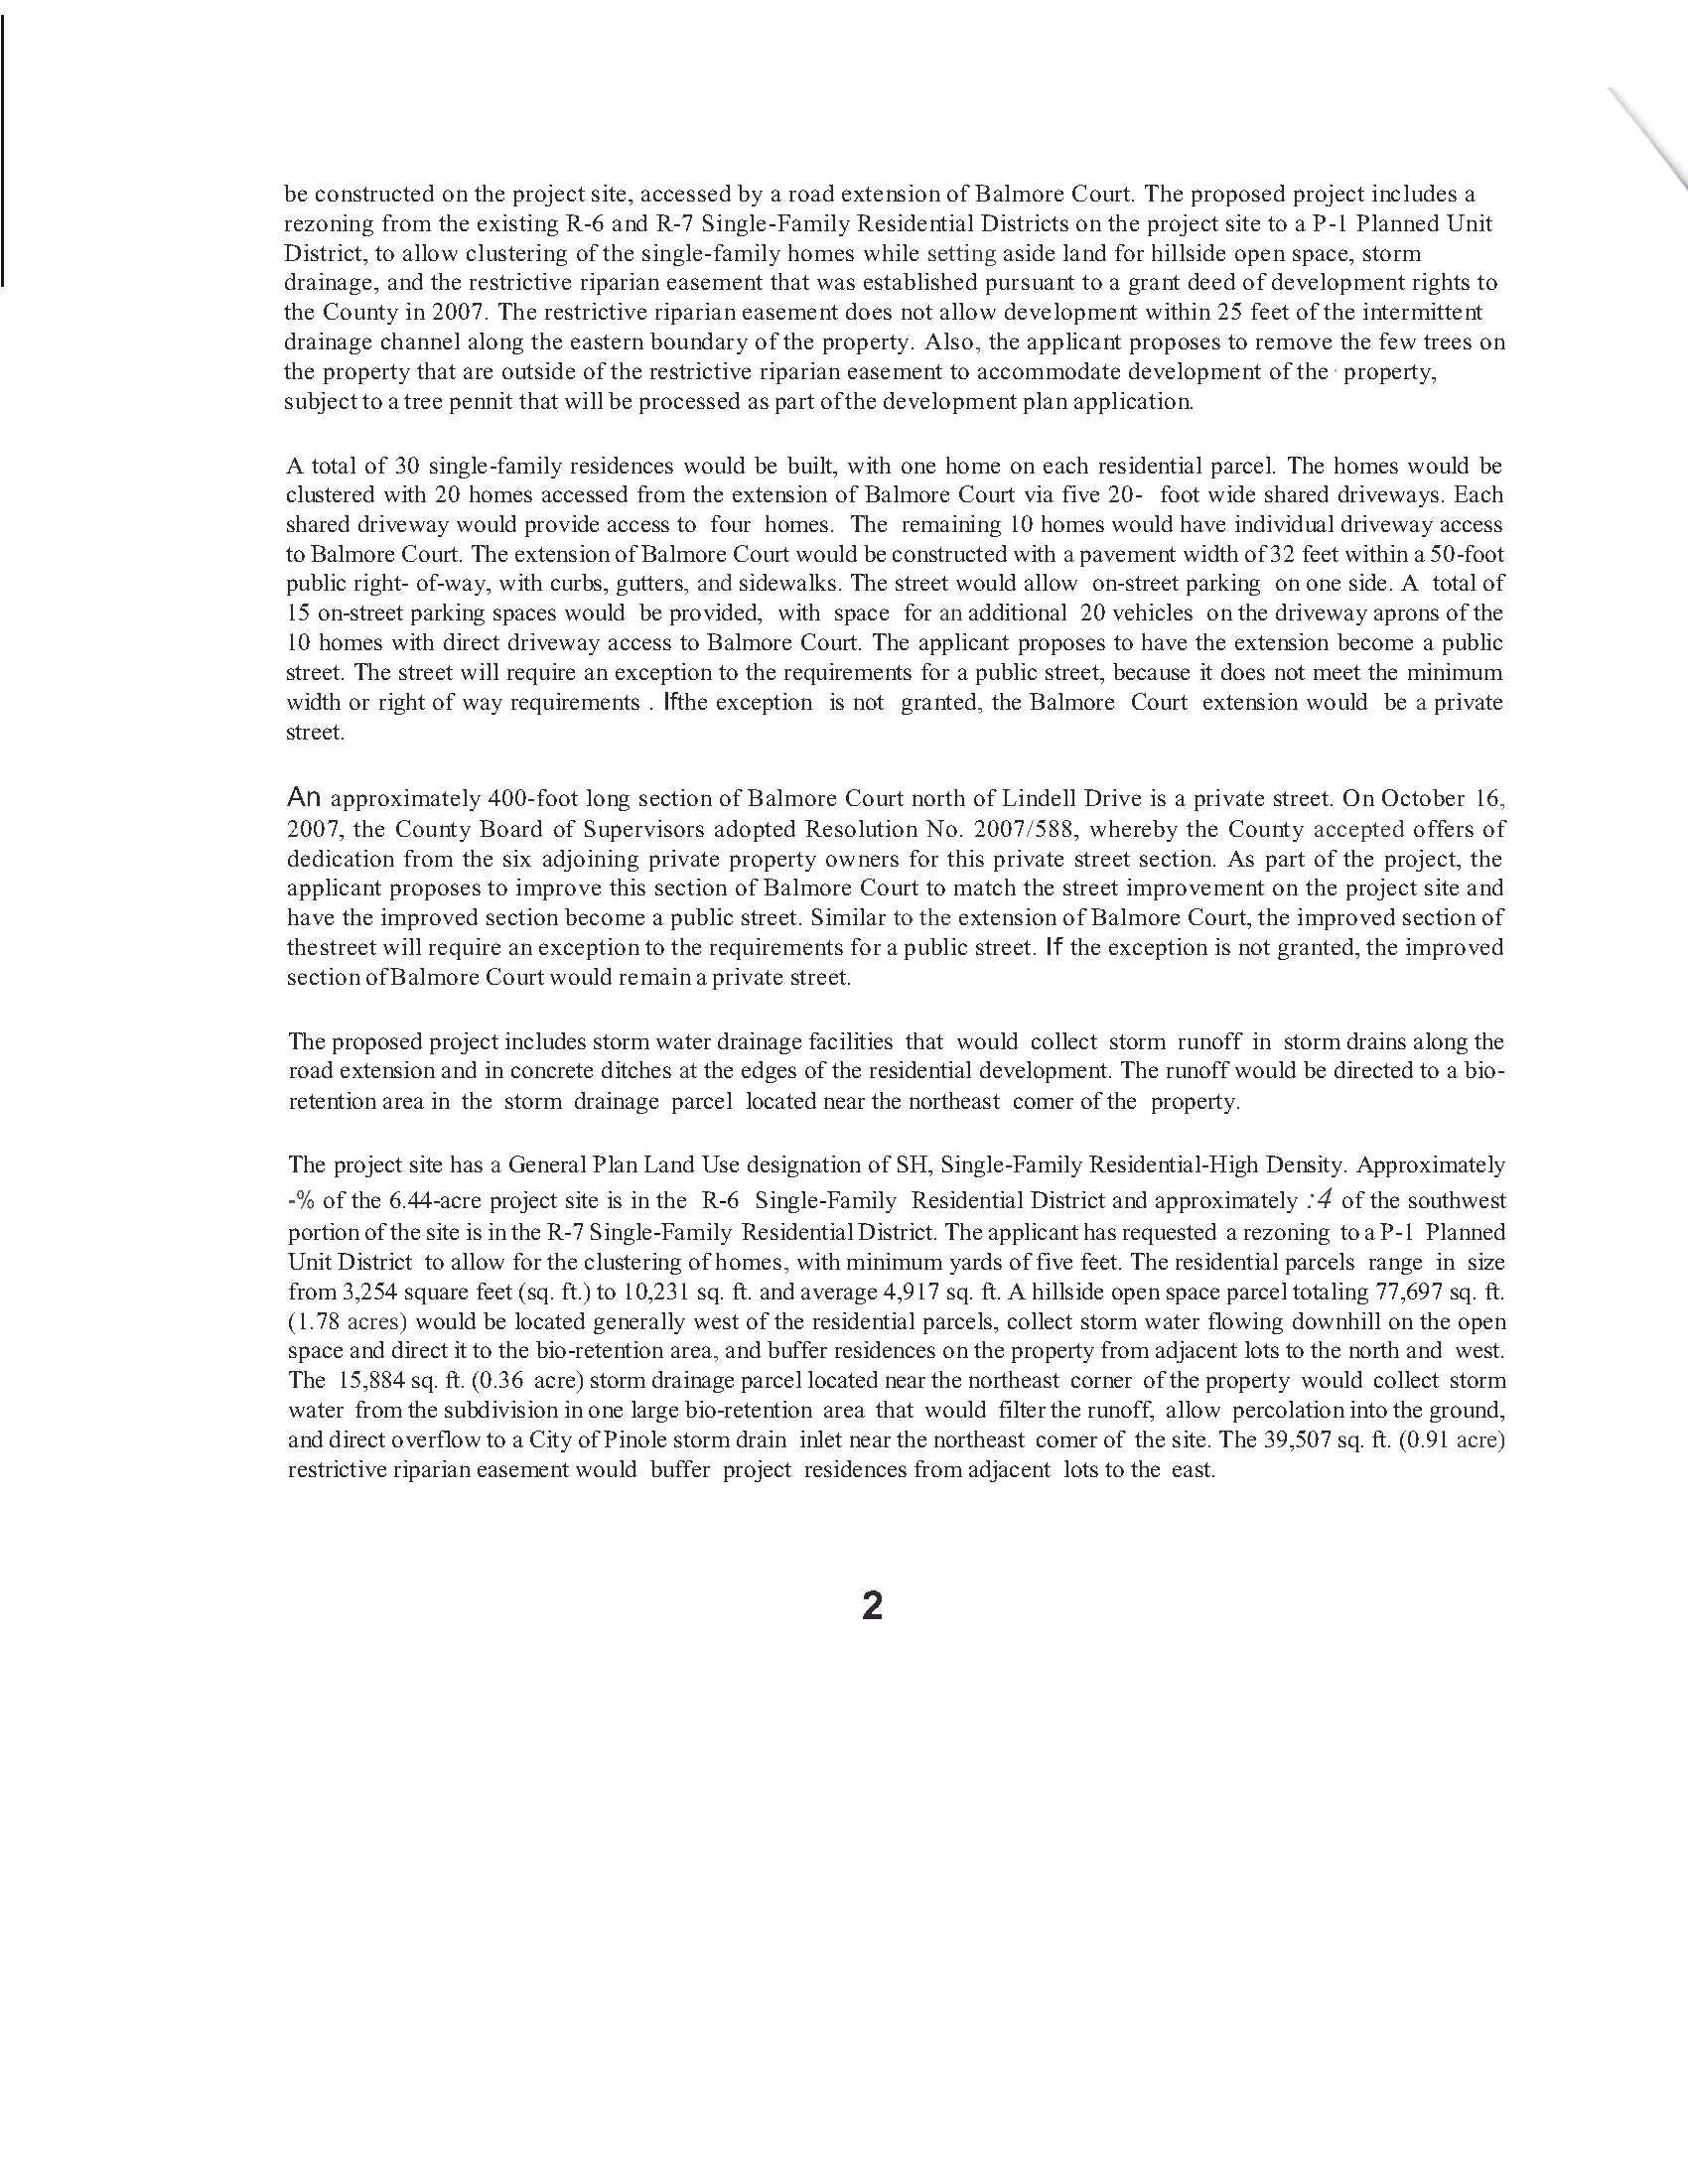 ESMAC Agenda 1.9.2019 (34 Pages)_8.jpg